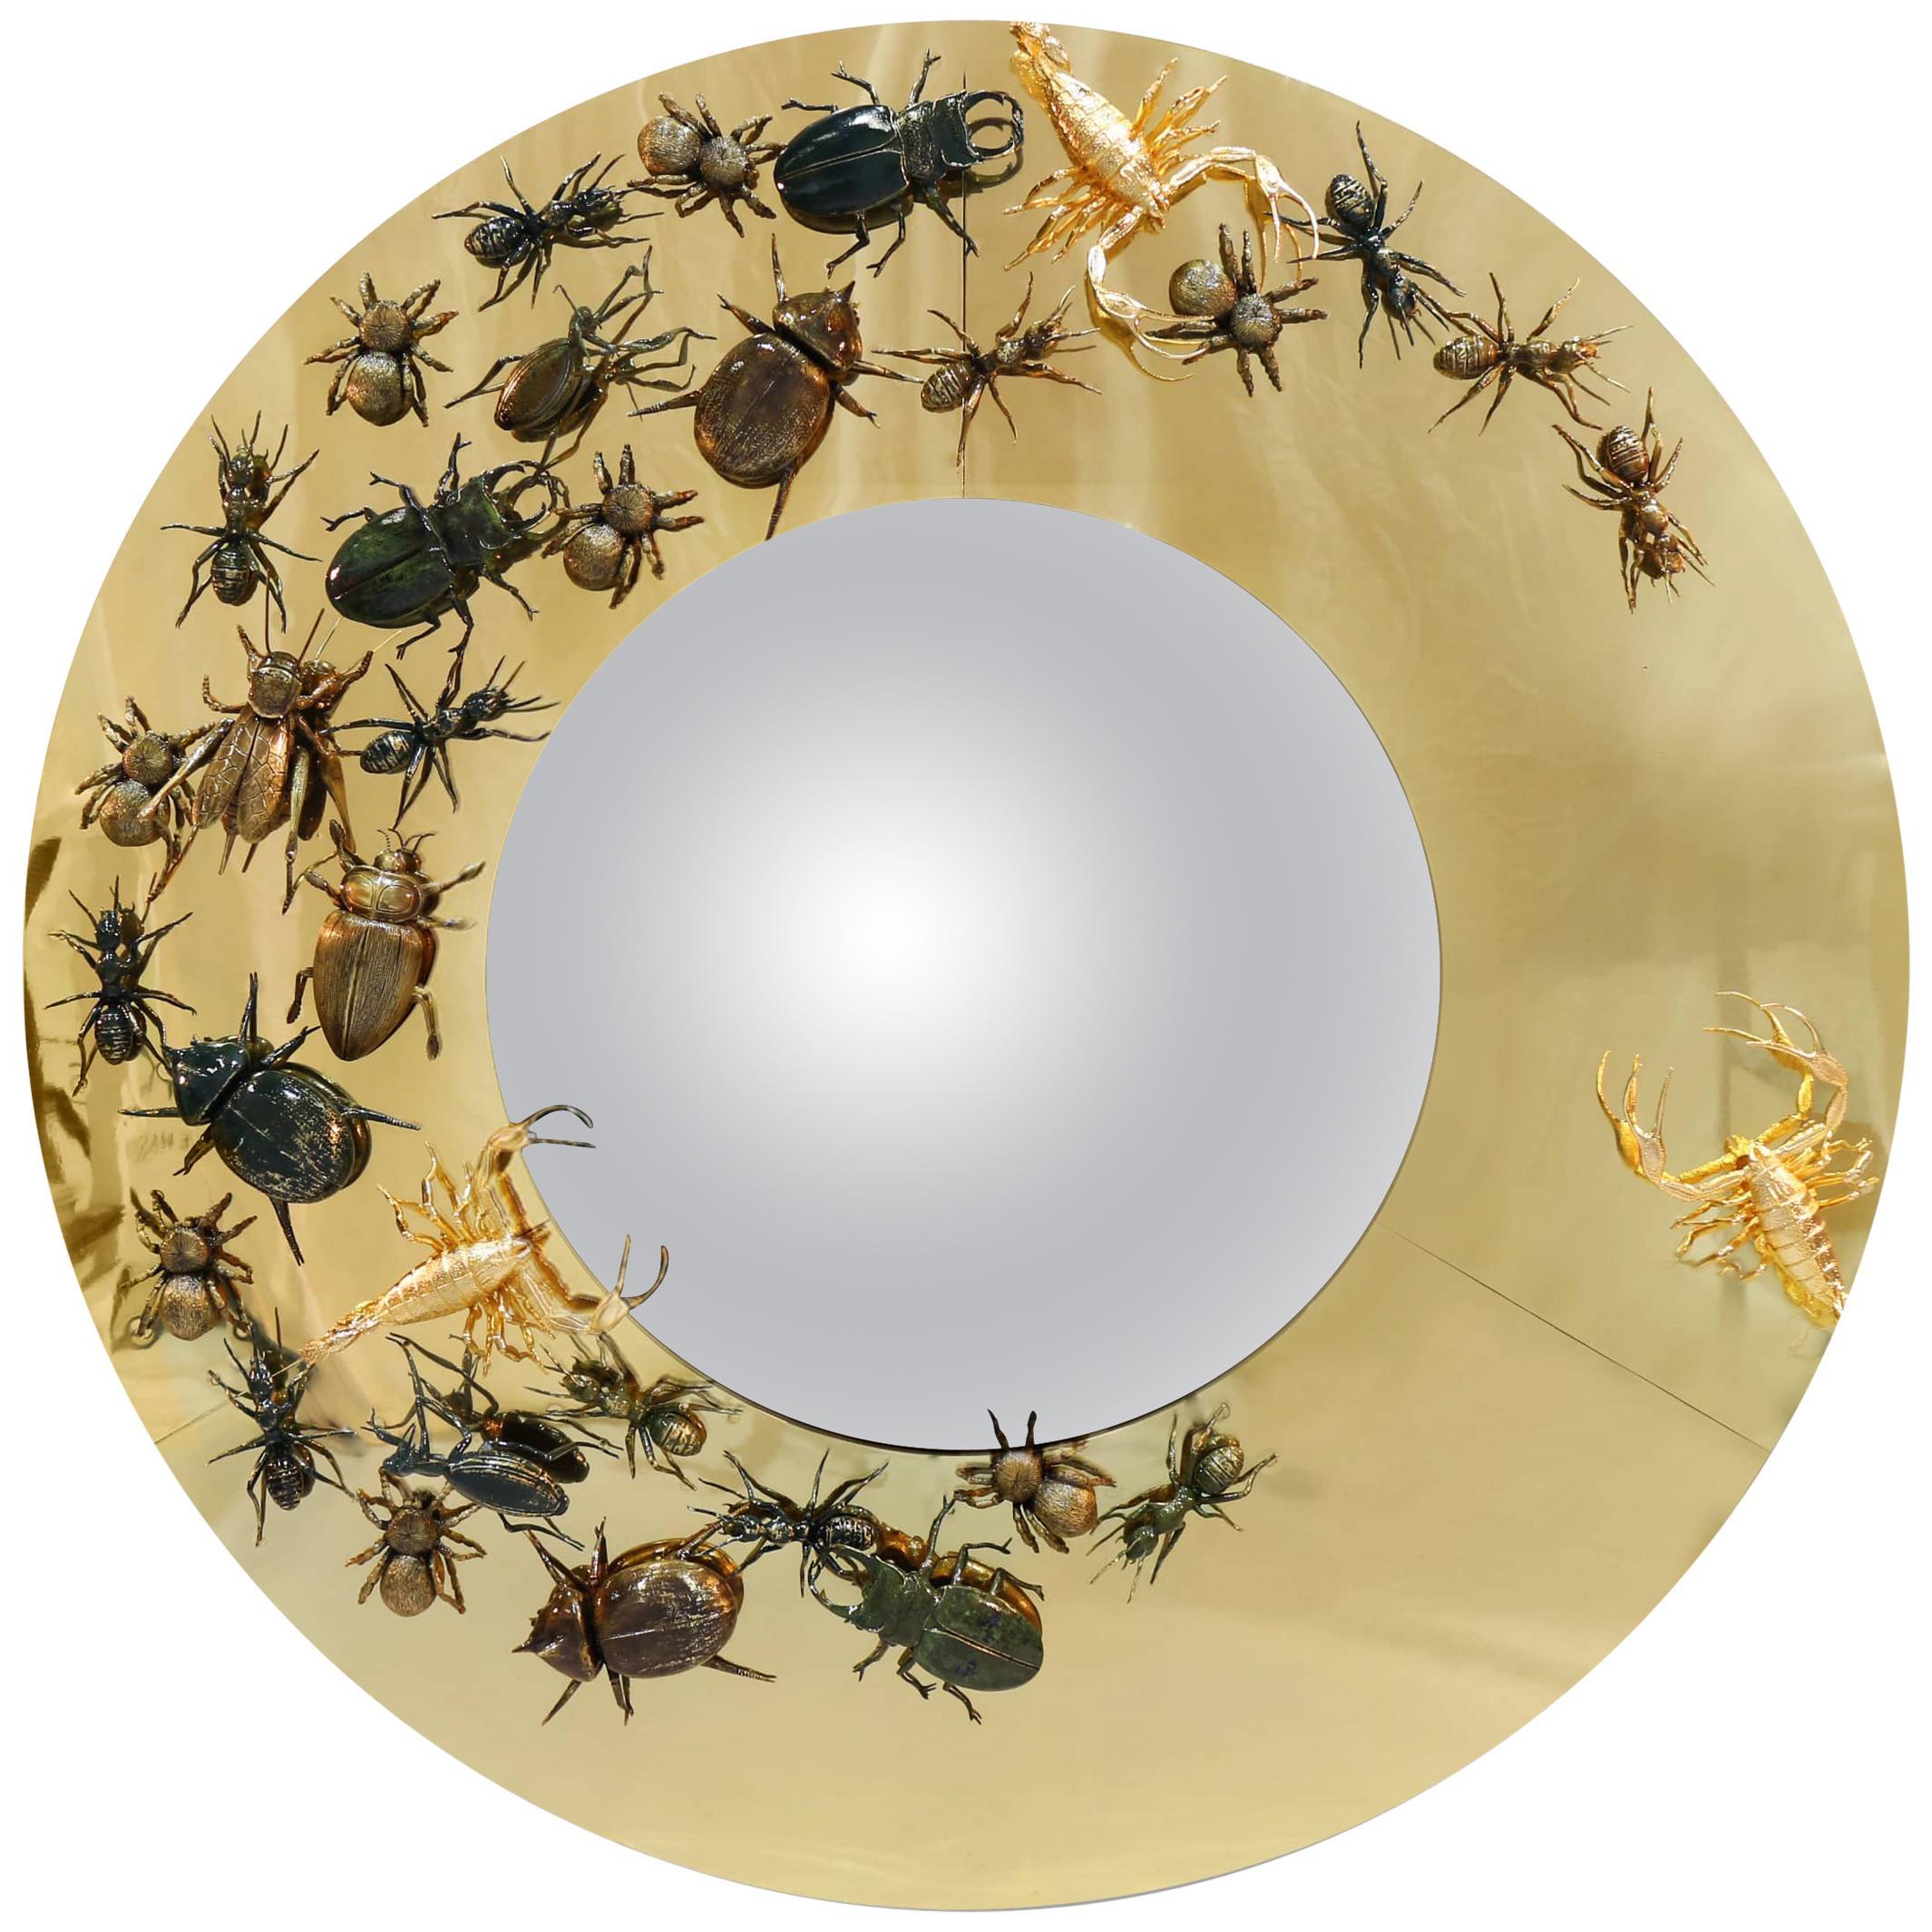 Metamorphosis Convex Mirror in Polished Brass